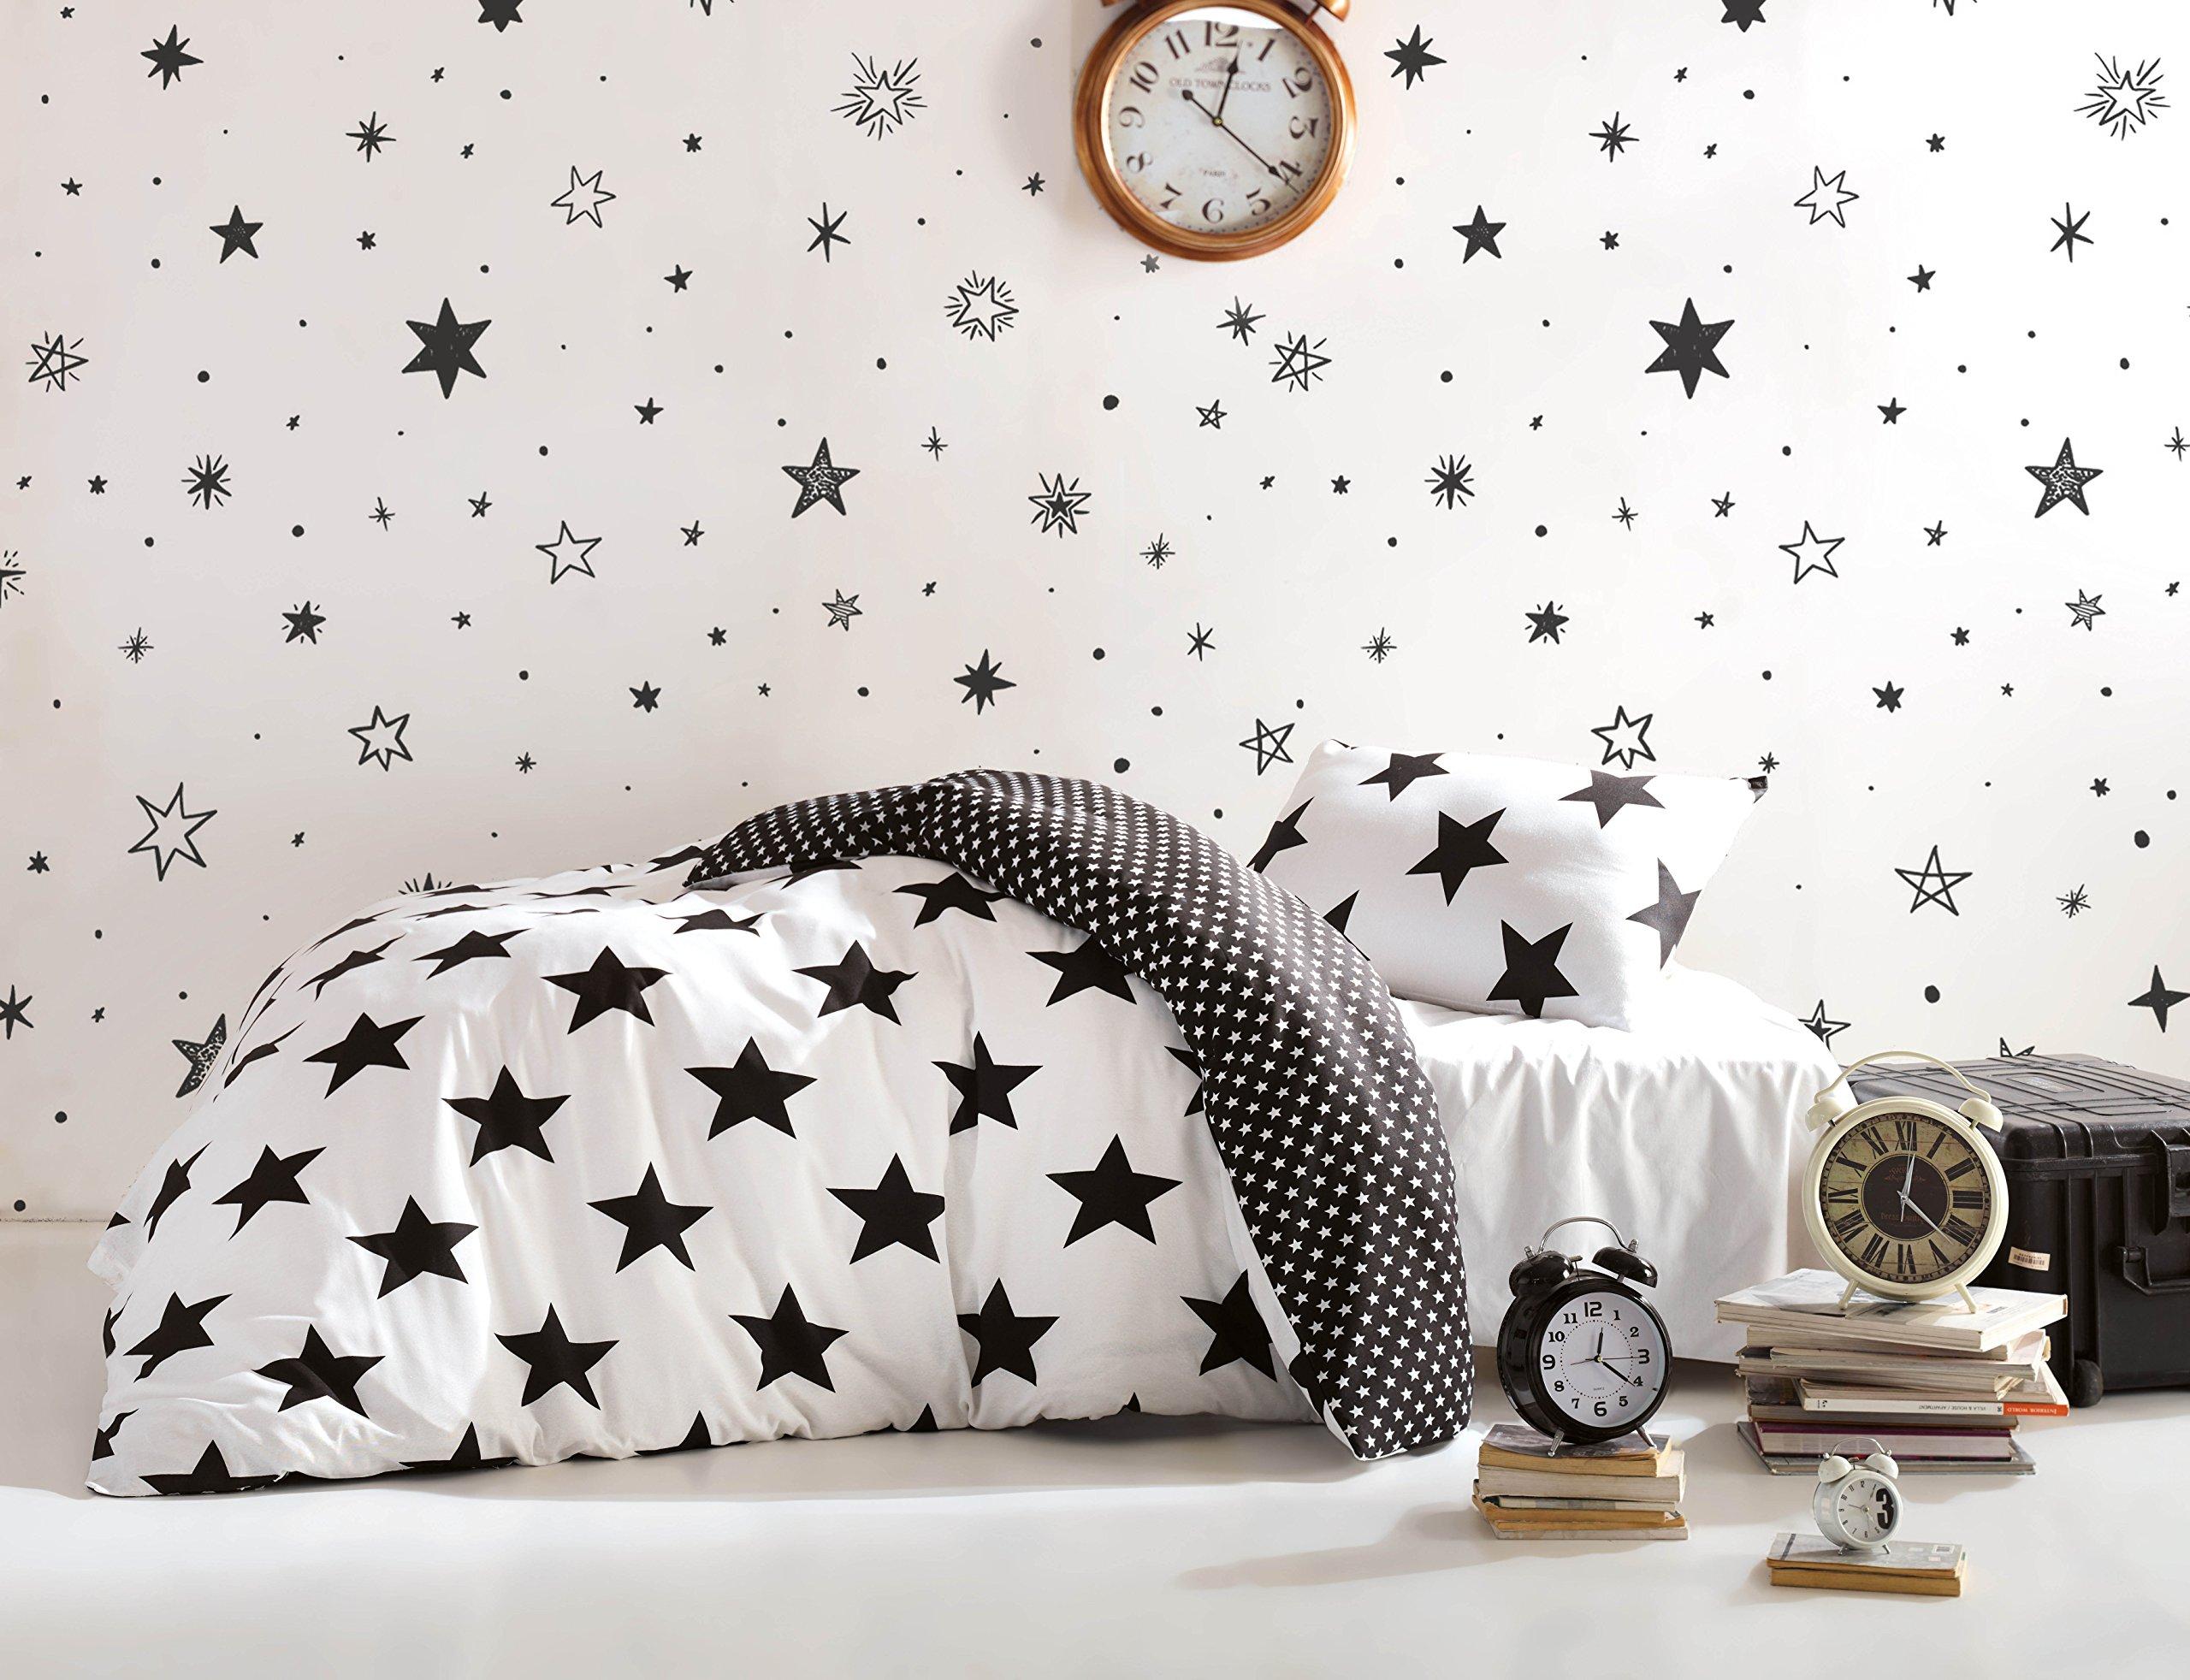 Stars Bedding Set Single Twin Size Quilt Duvet Cover Set Black And White Girls Boys Bed Set Reversible 3 Pcs Kitchen Dining